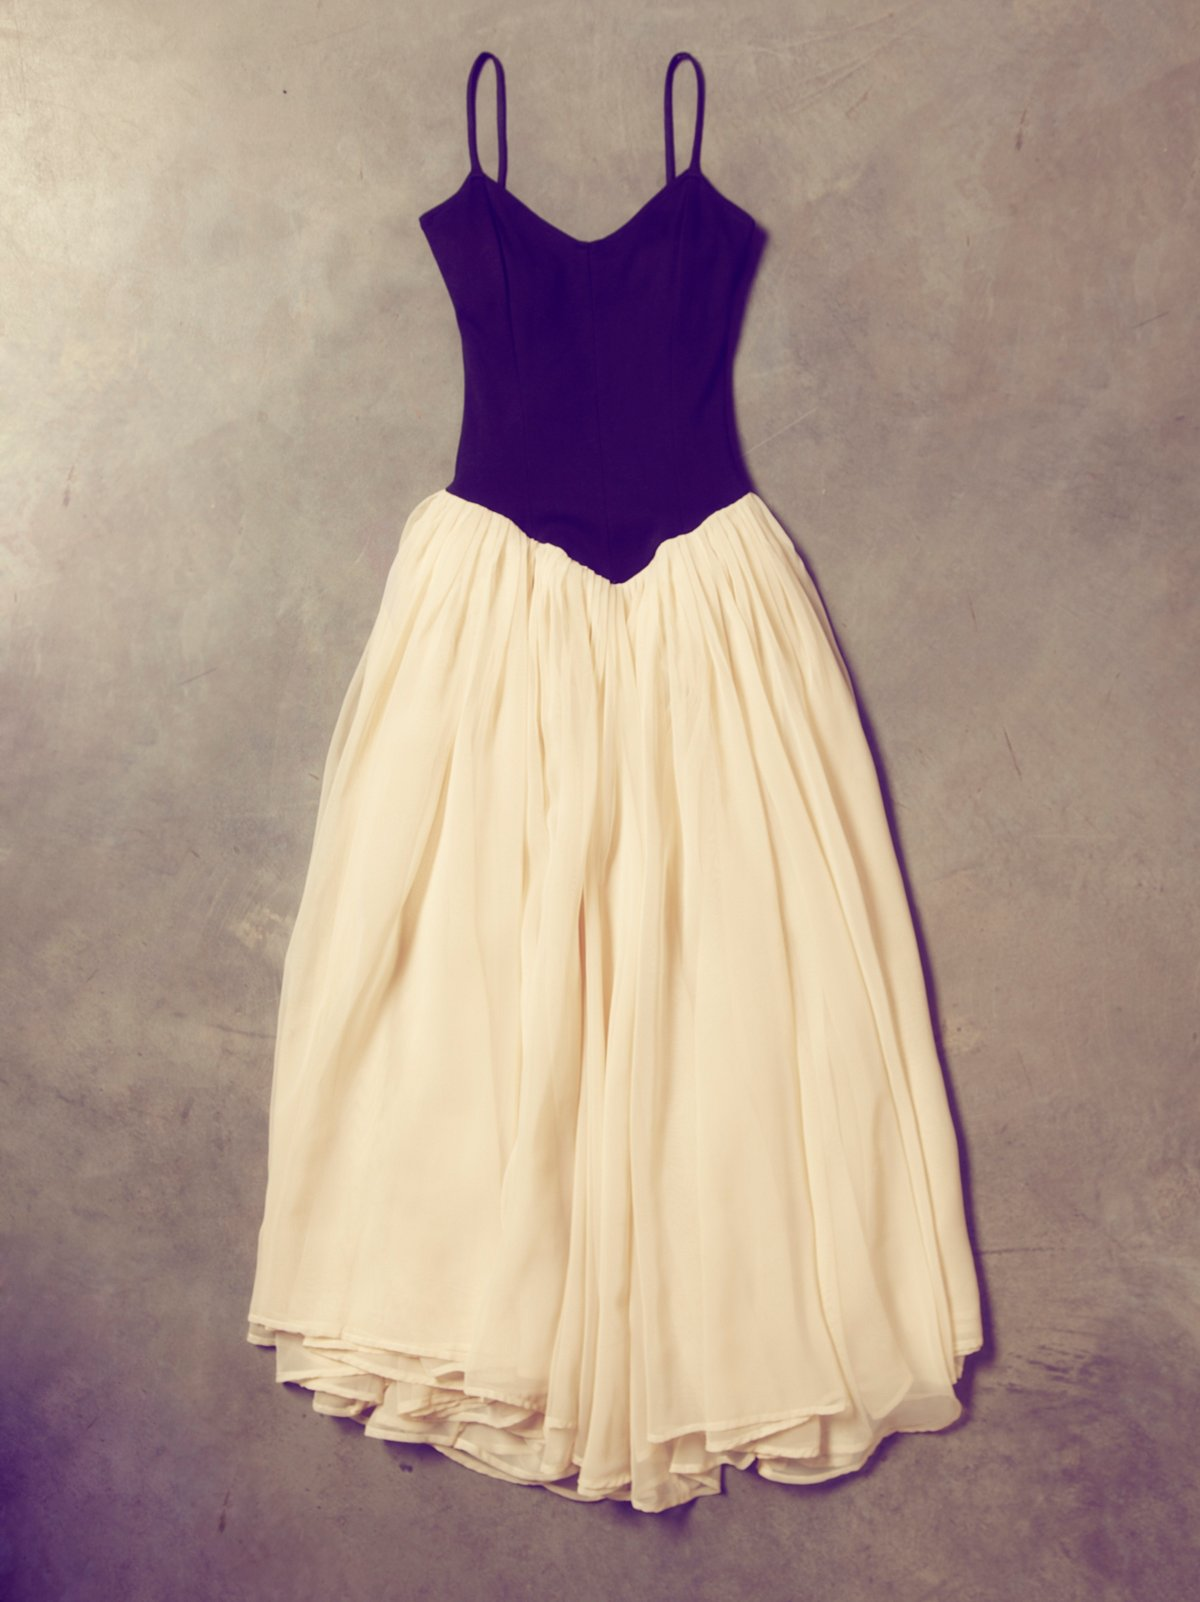 Vintage 70s Norma Kamali Ballerina Dress